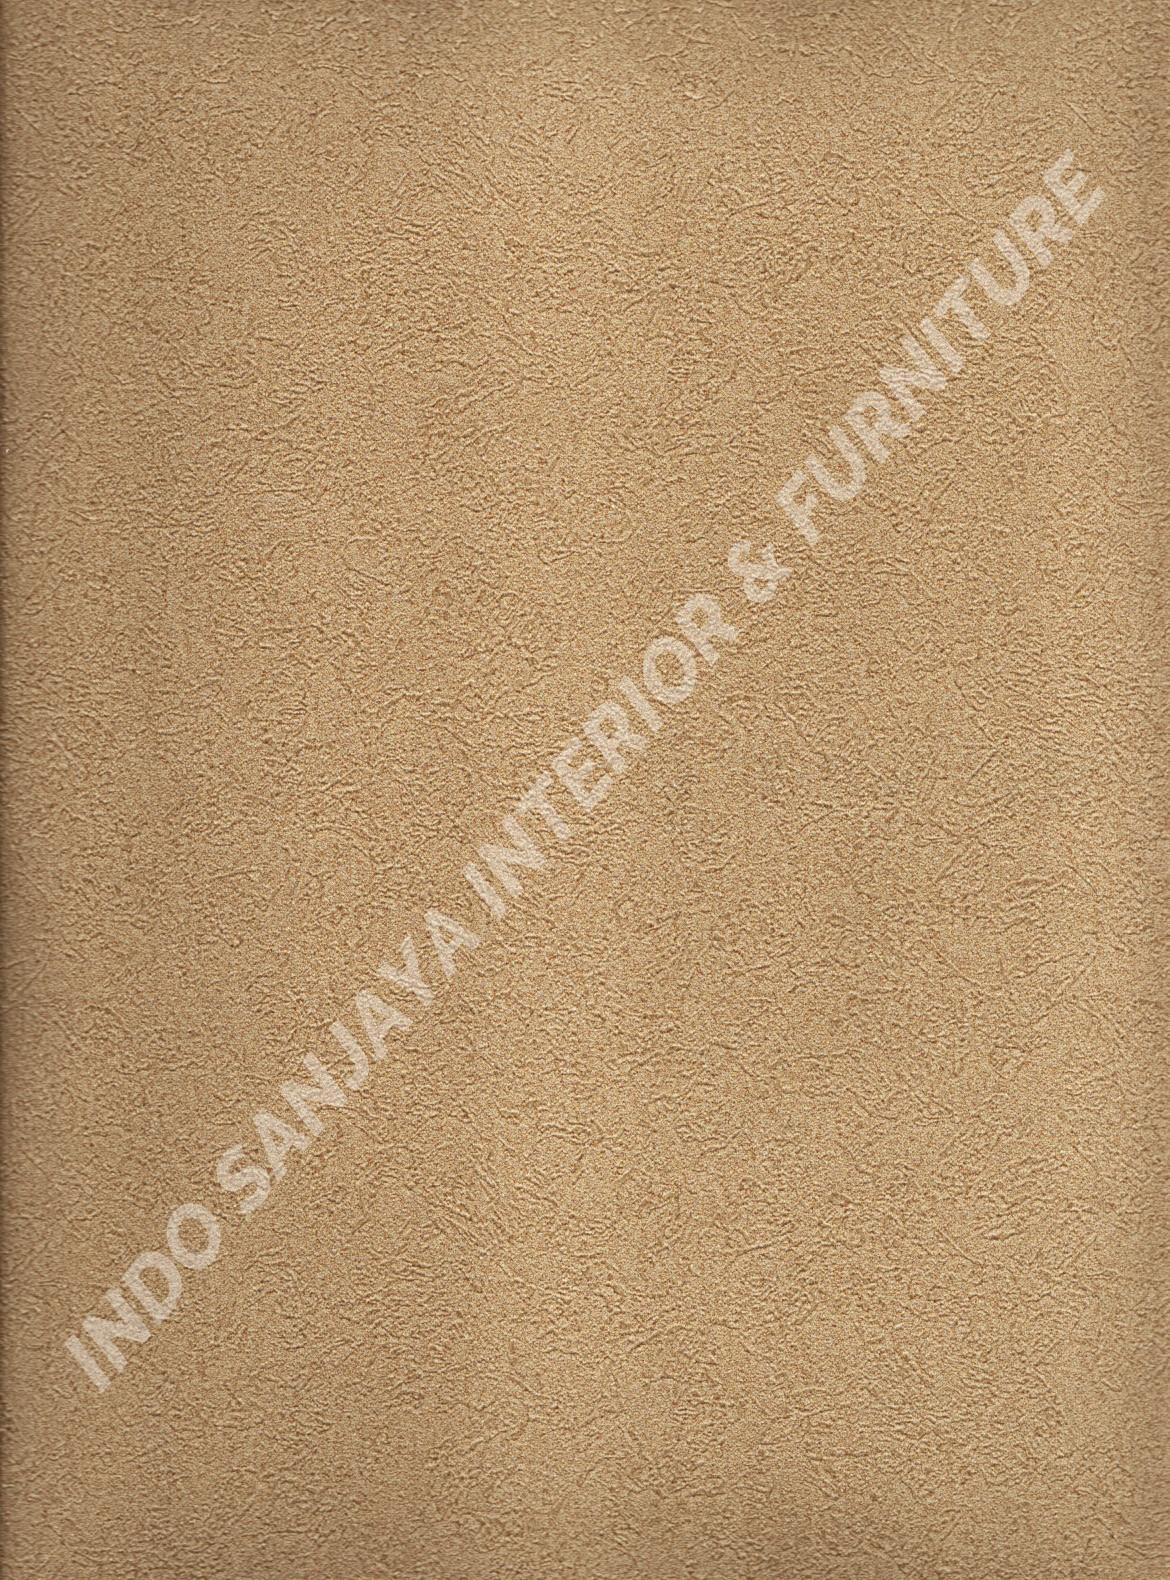 wallpaper   Wallpaper Minimalis Polos 11096:11096 corak  warna